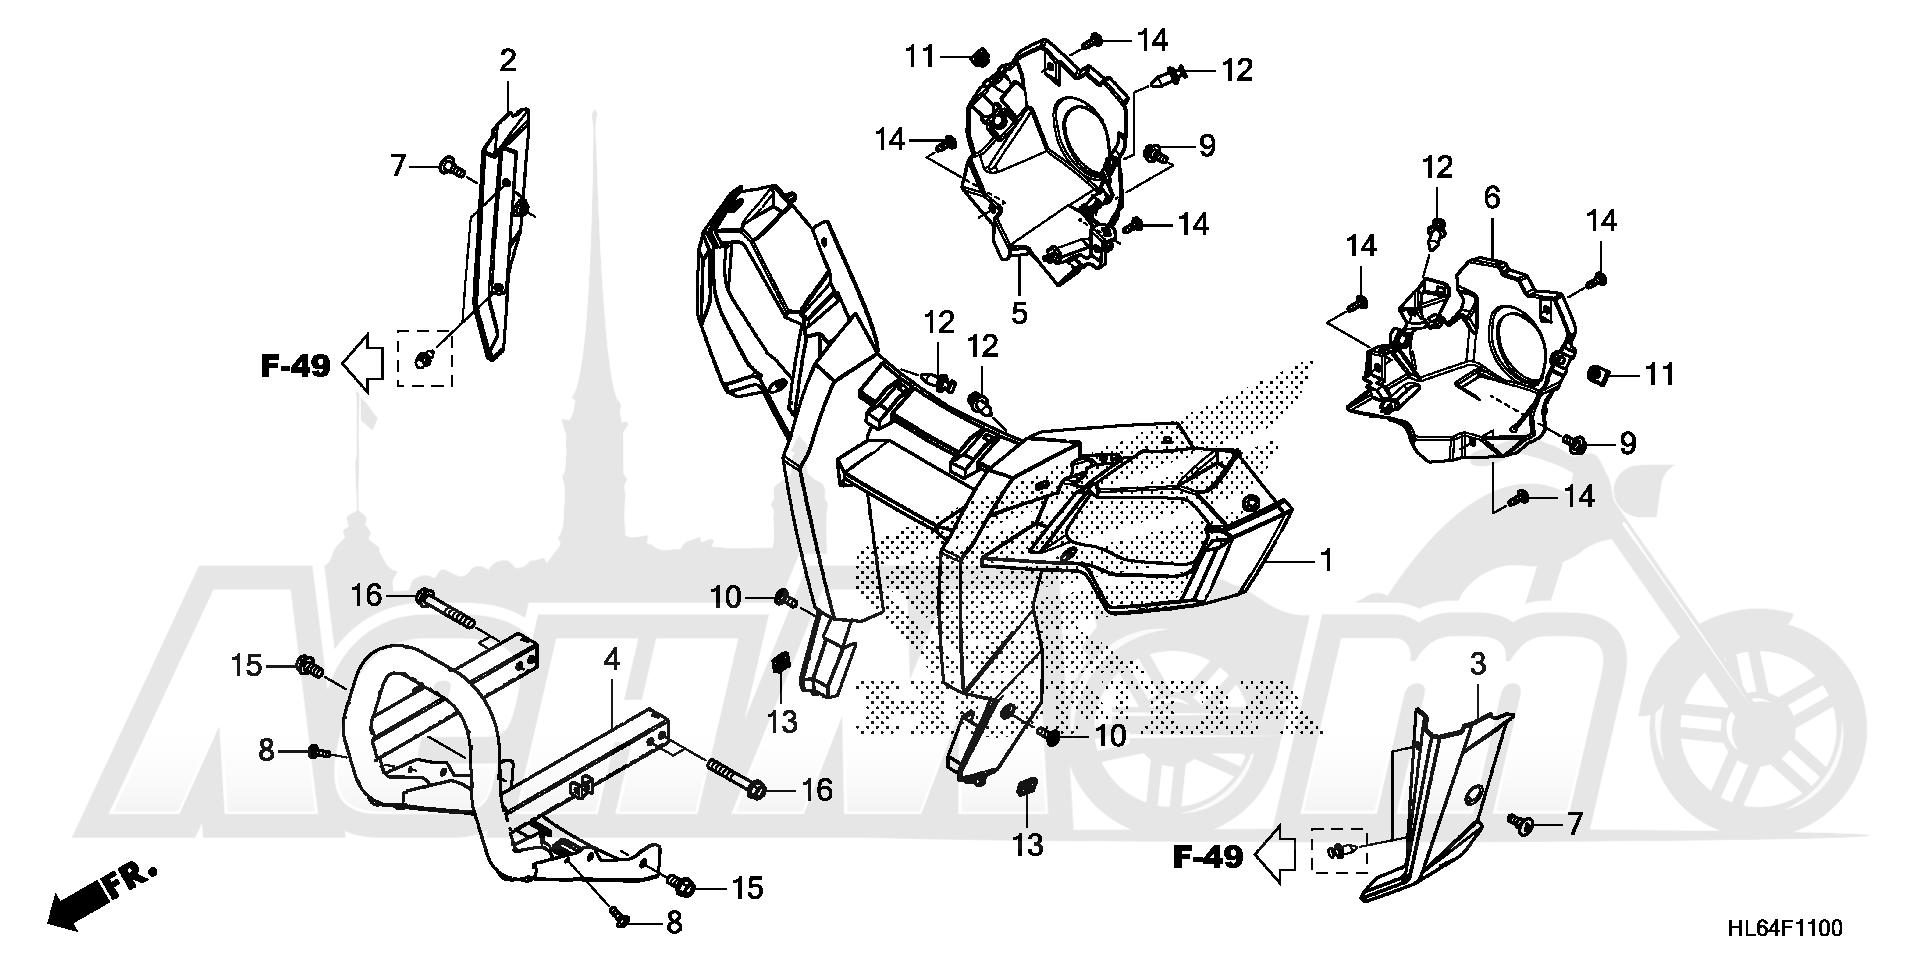 Запчасти для Квадроцикла Honda 2019 SXS1000S2X Раздел: FRONT GRILLE AND FRONT BUMPER   перед GRILLE и перед бампер